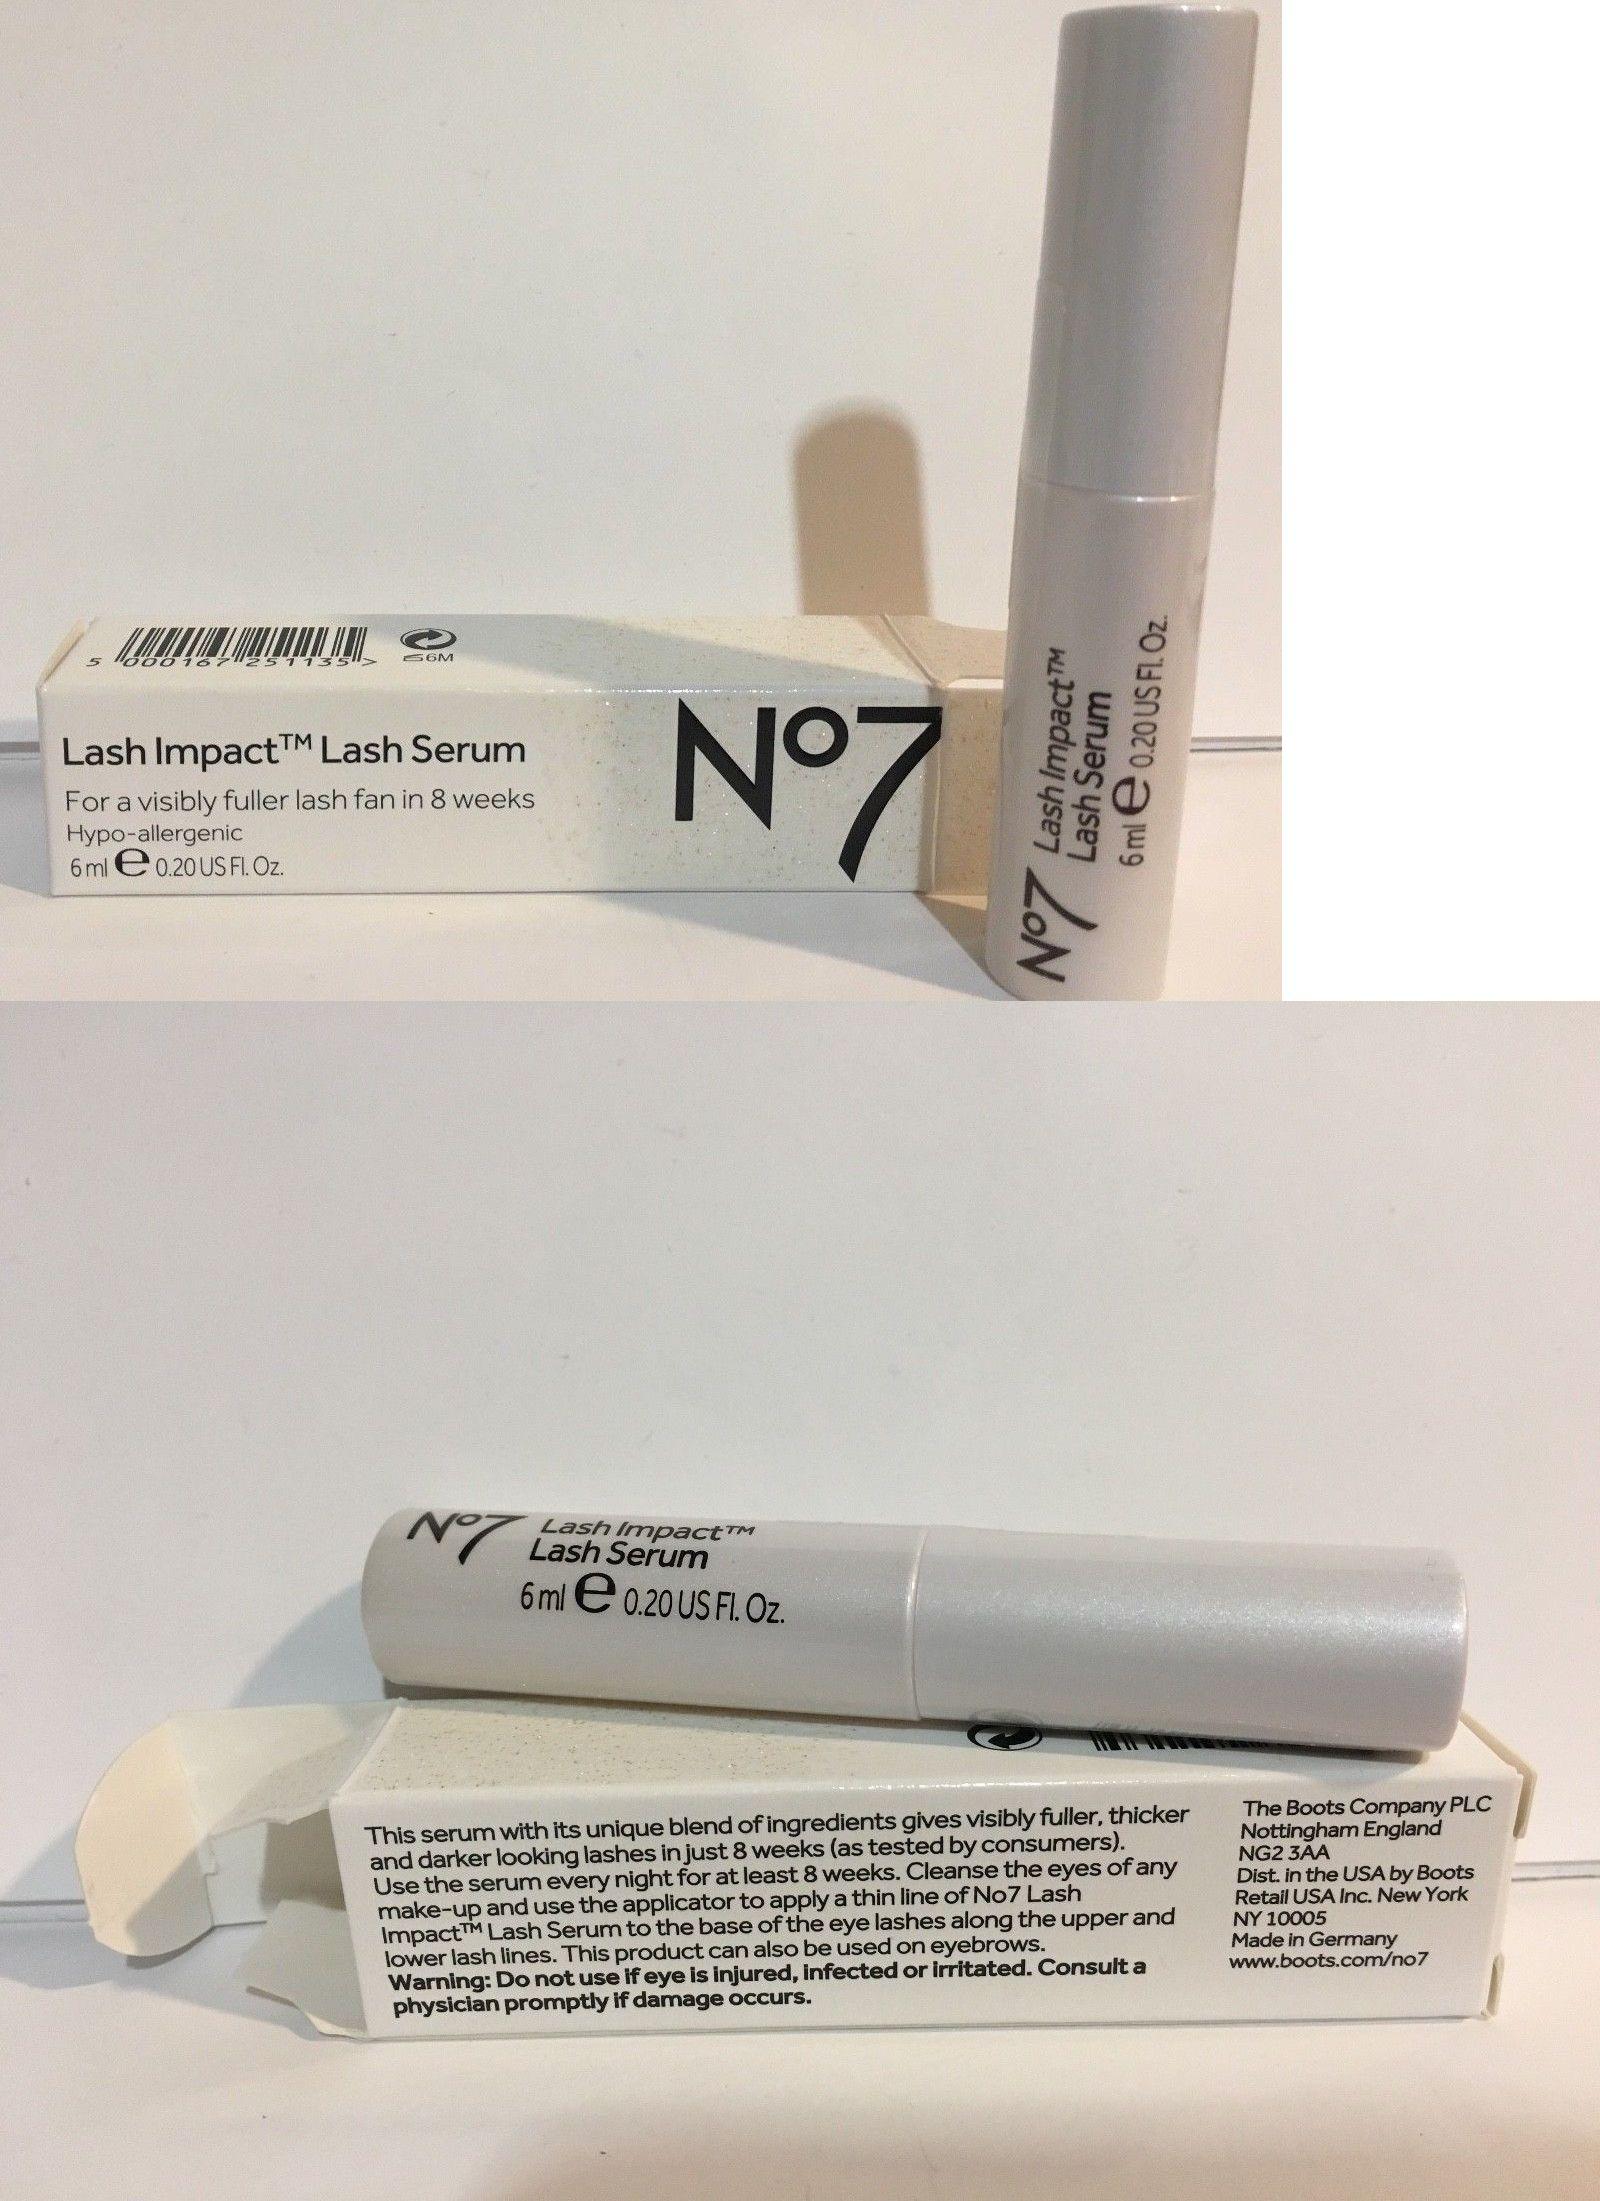 Boots No 7 No7 Lash Impact Lash Serum Replaced Fenomenal Serum 02oz